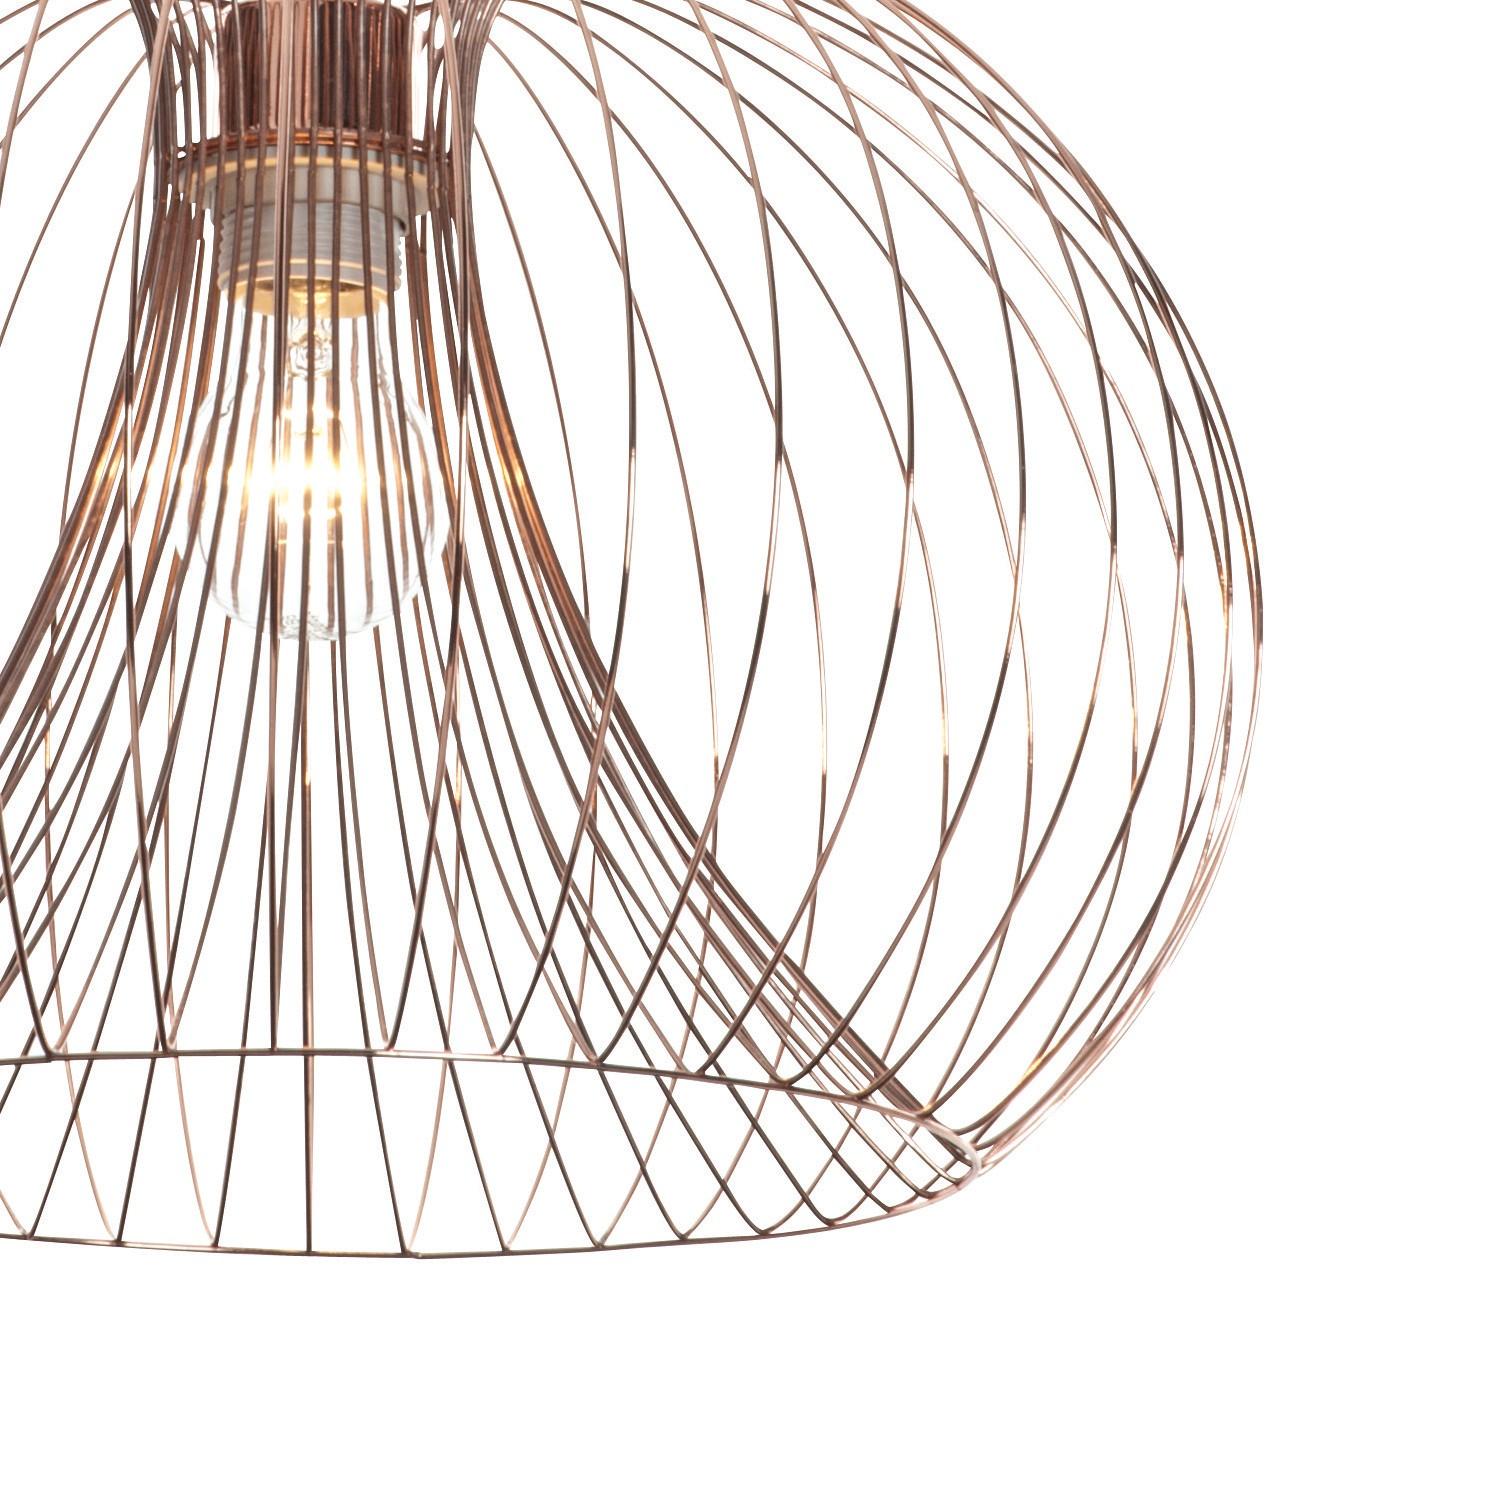 Awesome Contemporary Modern Copper Wire Ceiling Pendant Chandelier Light Shade Wiring Cloud Counpengheilarigresichrocarnosporgarnagrebsunhorelemohammedshrineorg